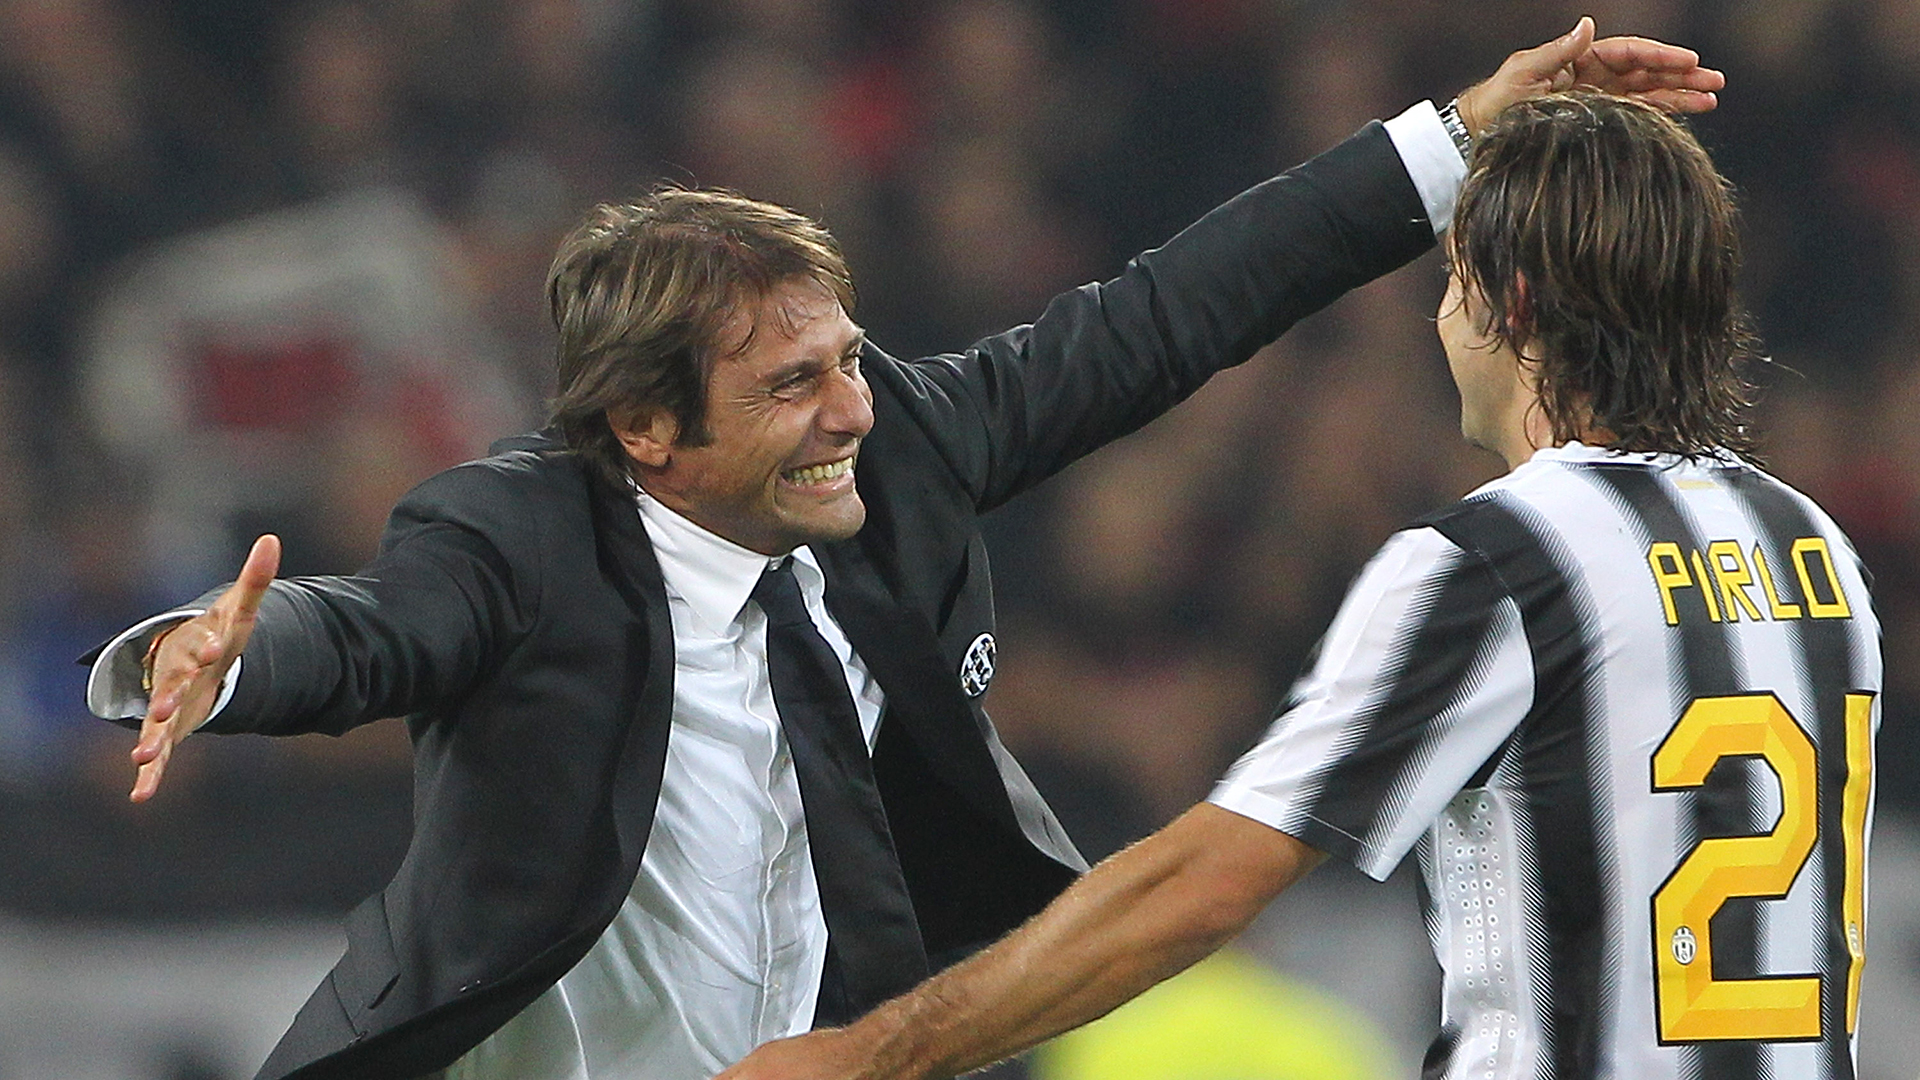 Antonio Conte Andrea Pirlo Juventus